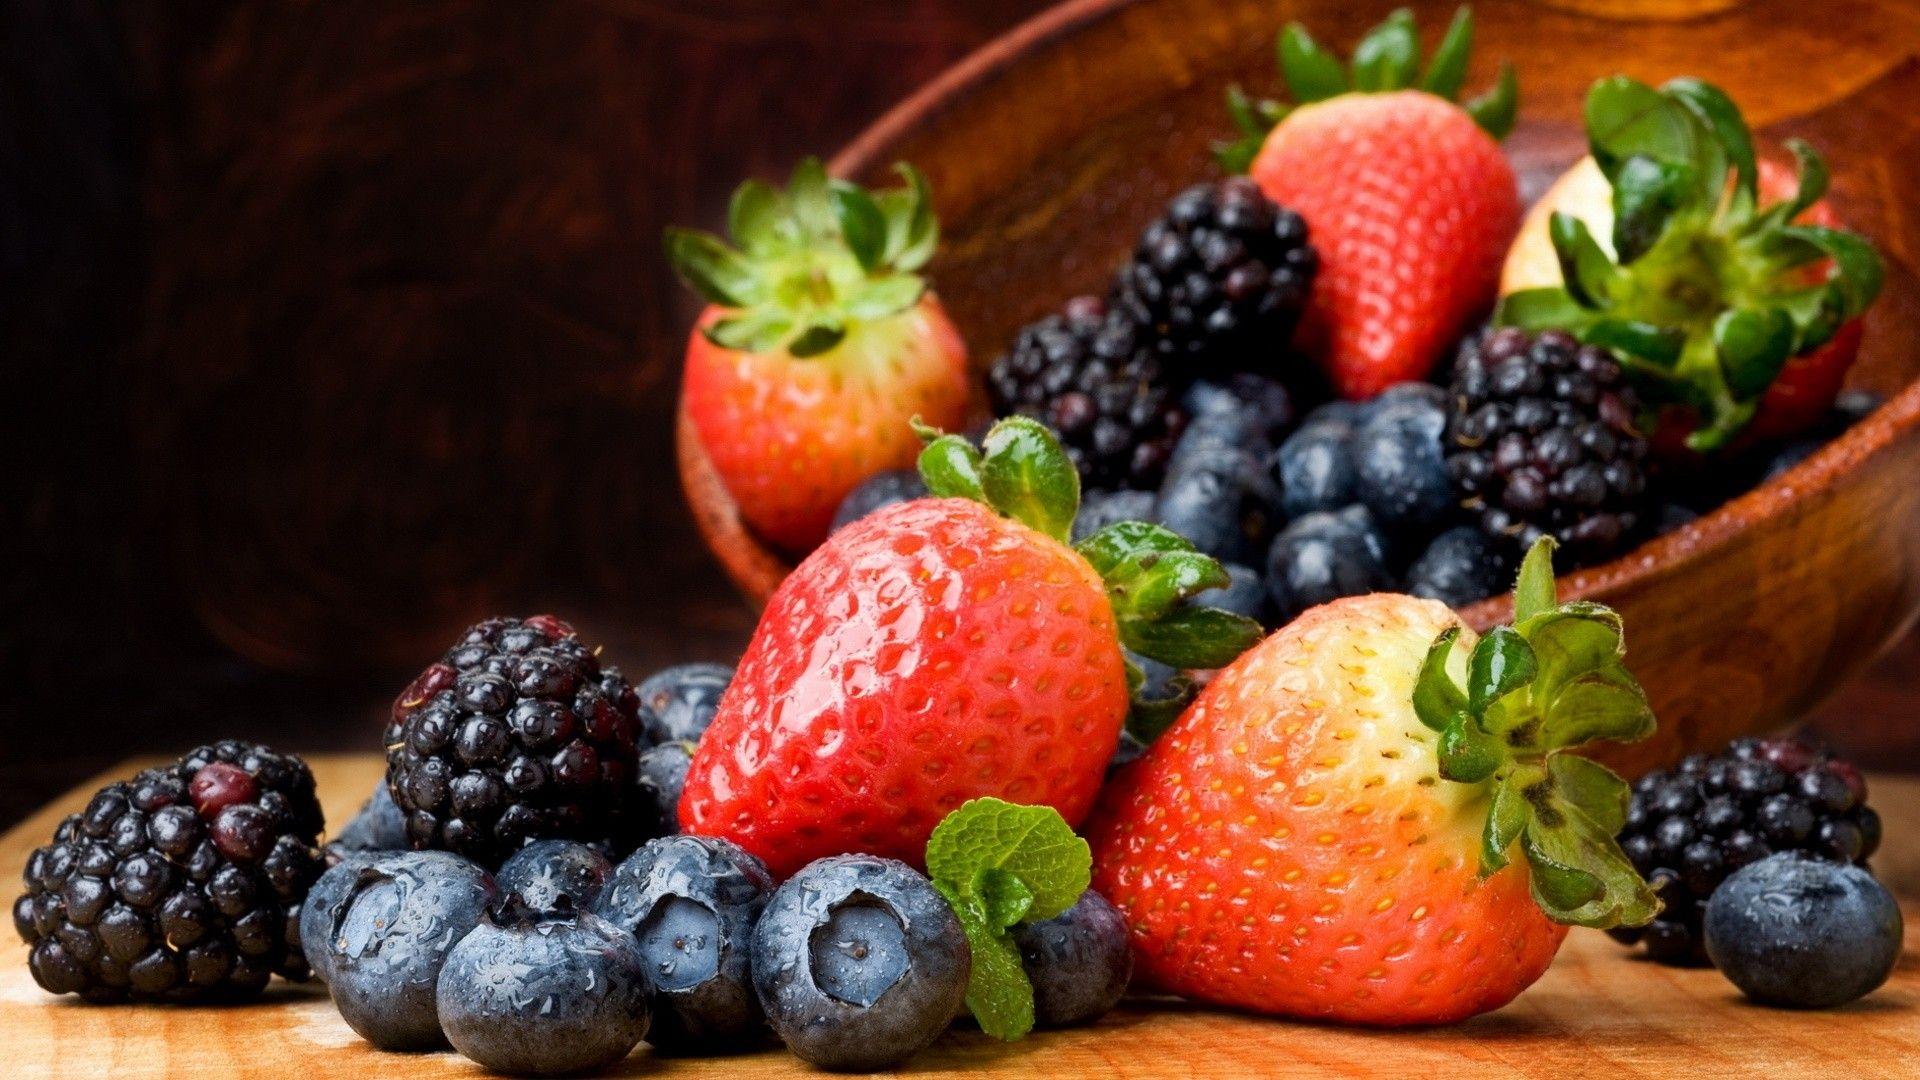 Food Fruits Wallpapers Hd Food Simple Nutrition Fruit